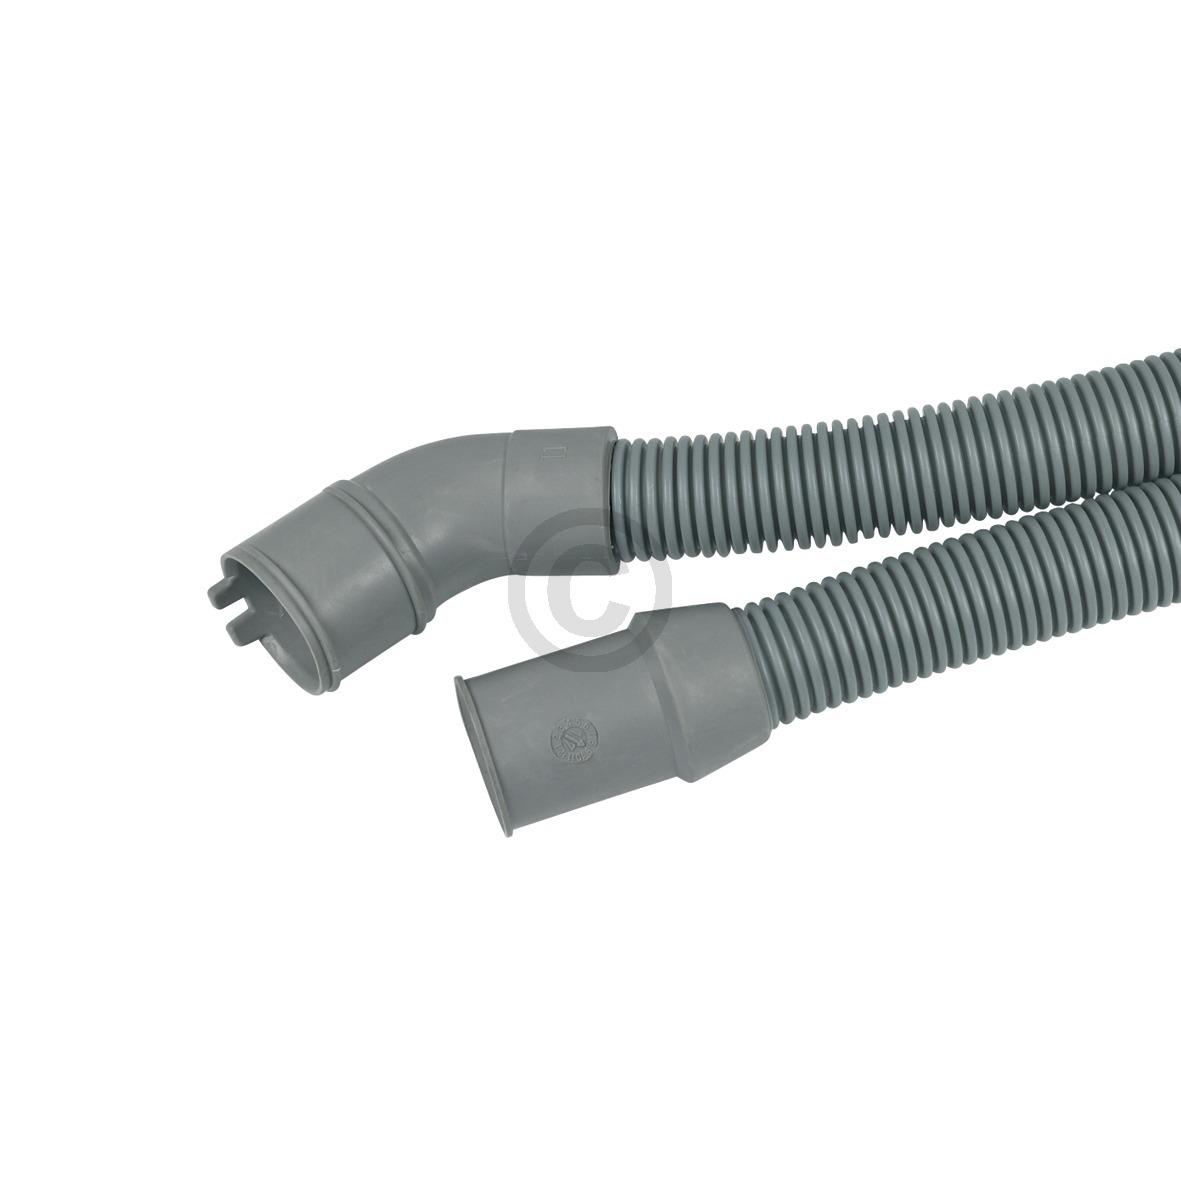 Ablaufschlauch Electrolux 14000563305/6 21/26mmØ 2,2m für Geschirrspüler